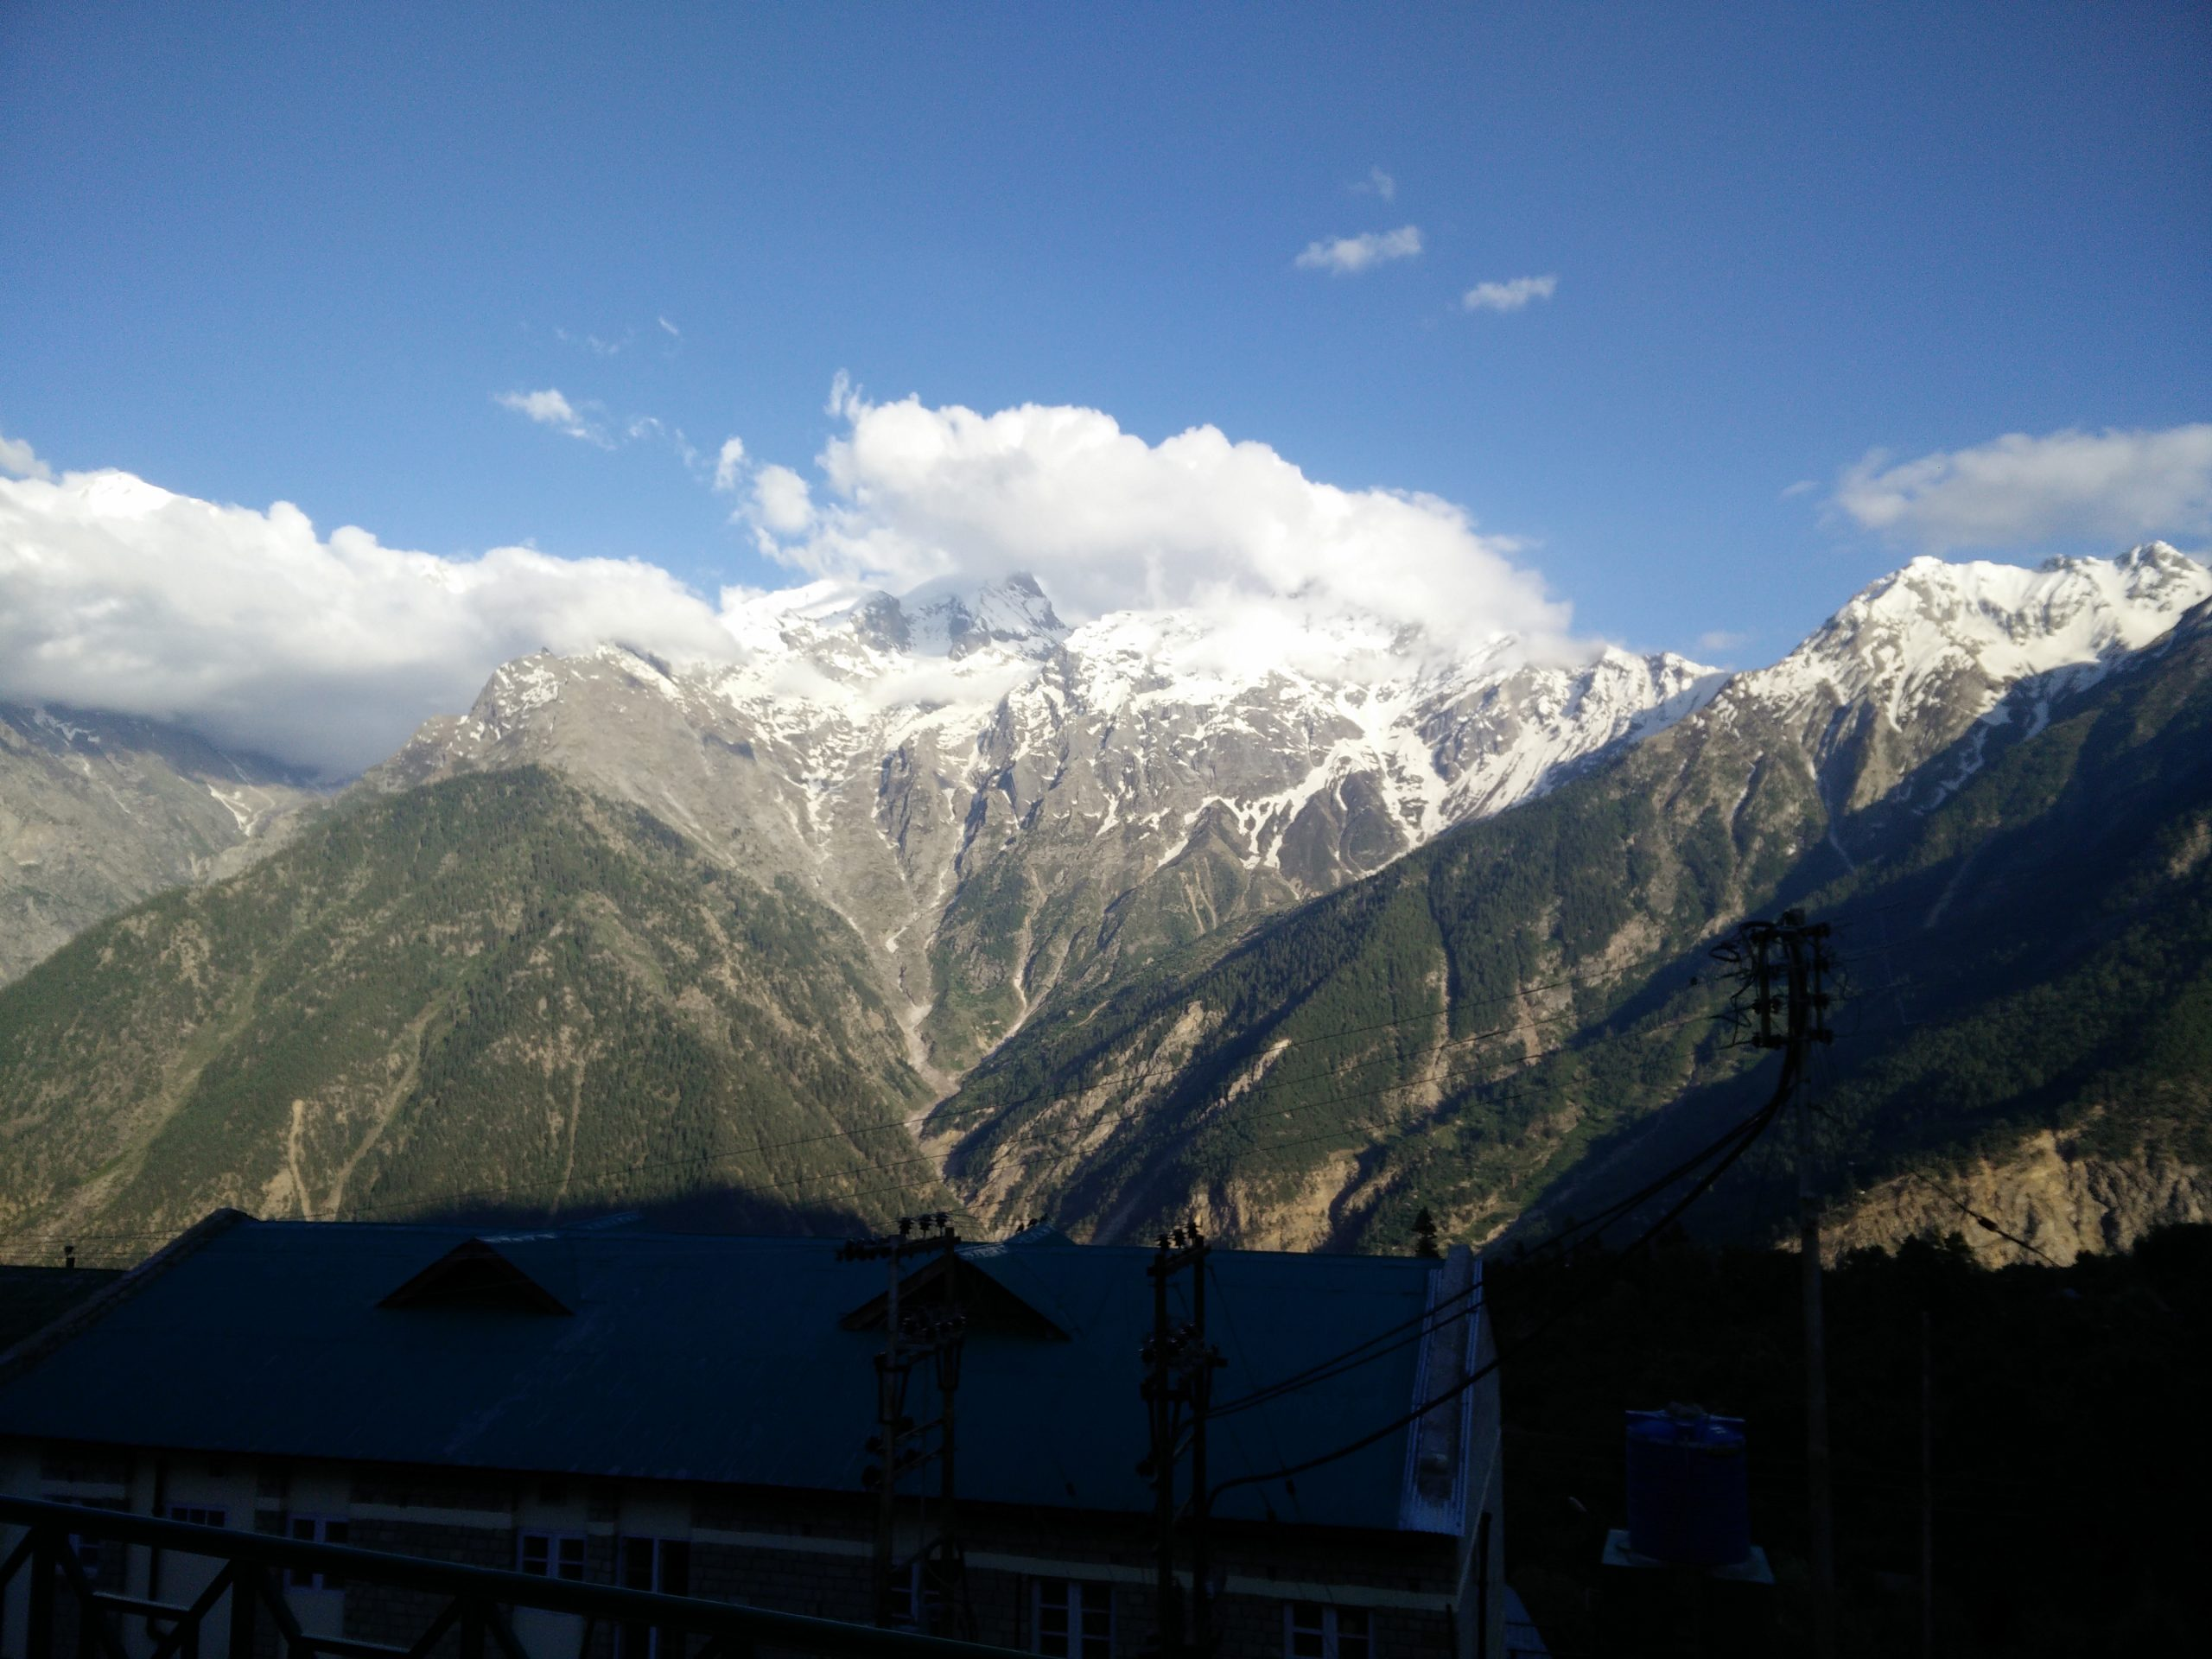 Serene mountains of Kalpa, Kinnaur.